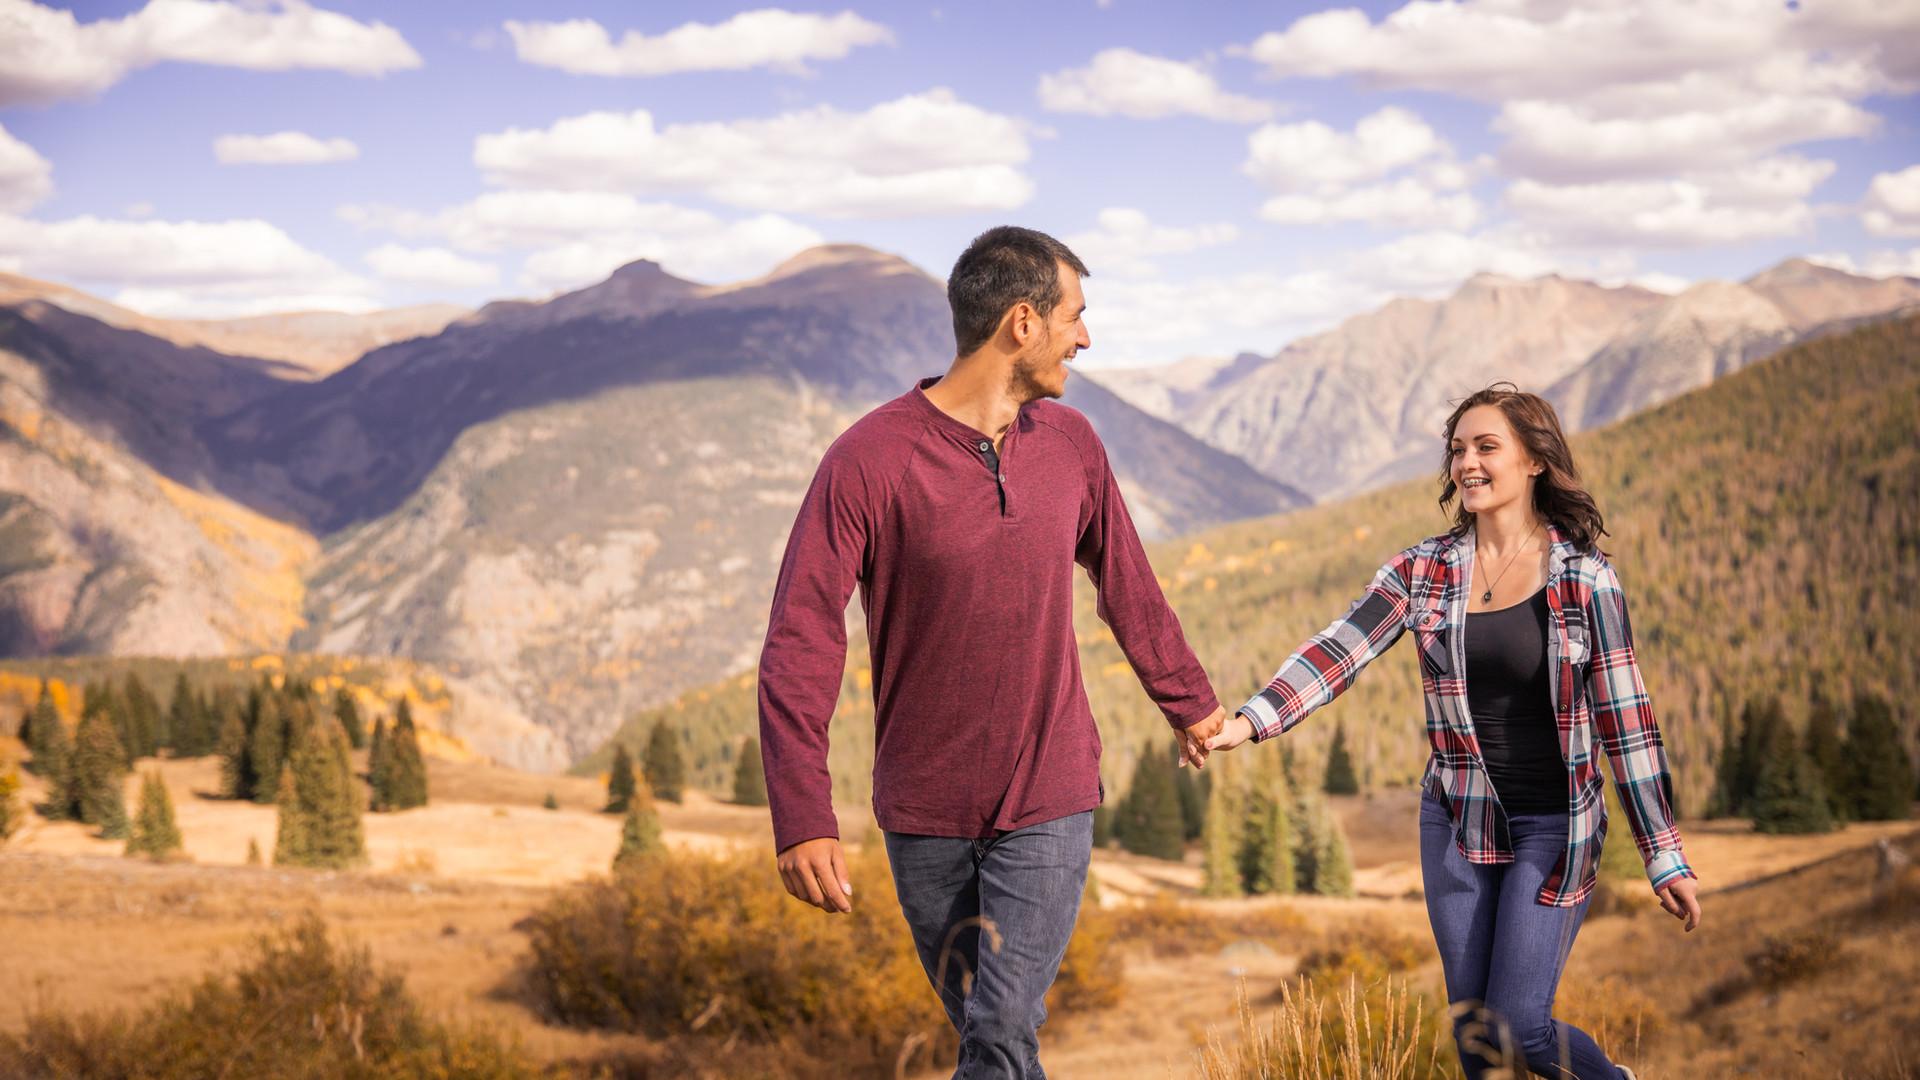 Mountain Adventure Couple Photos Portraits